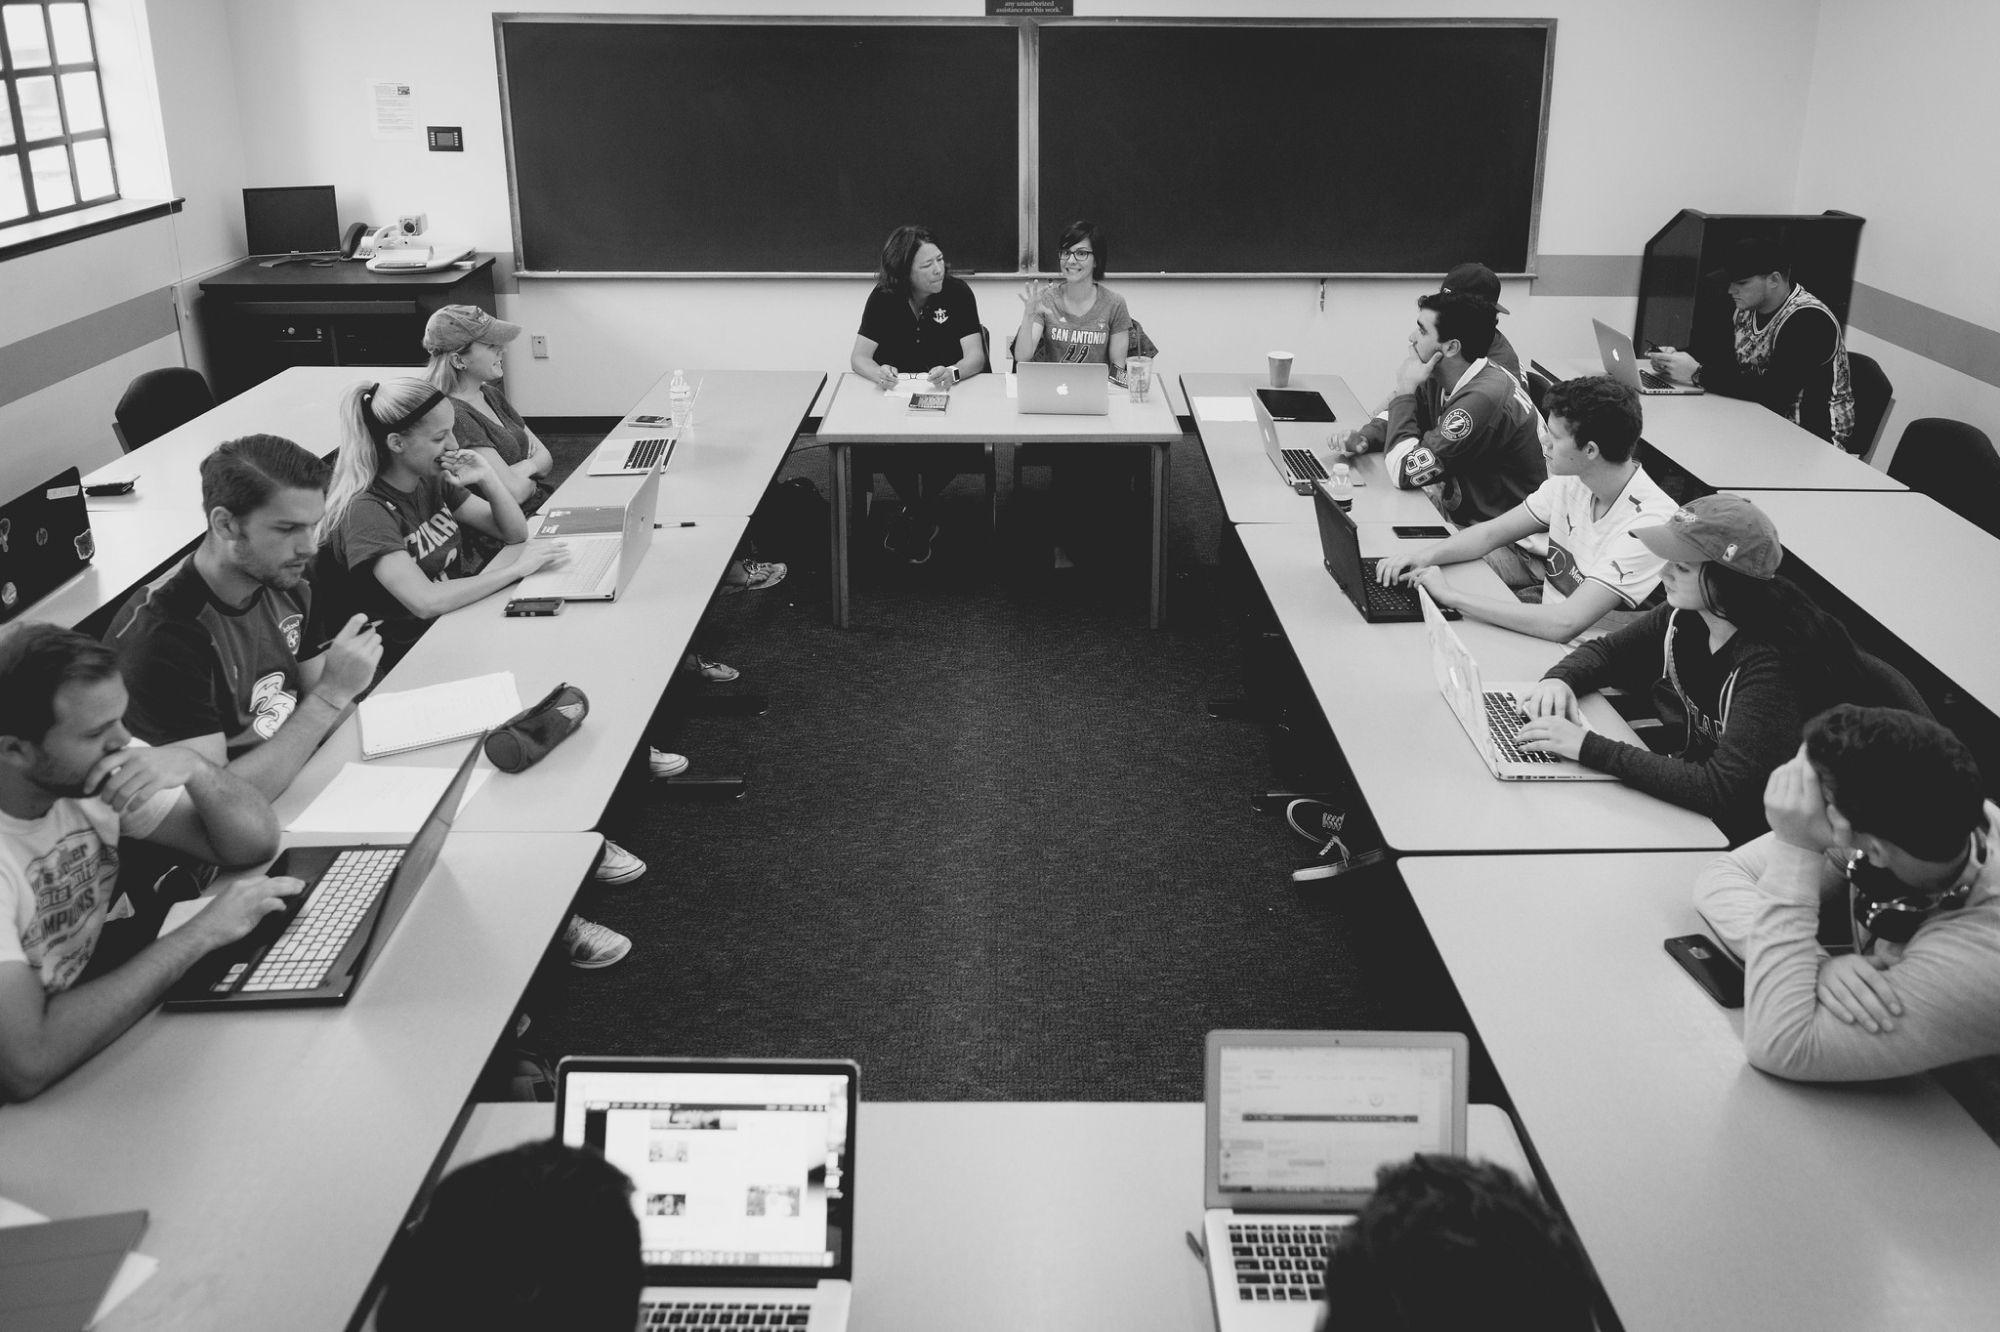 The Sports Analytics classroom.